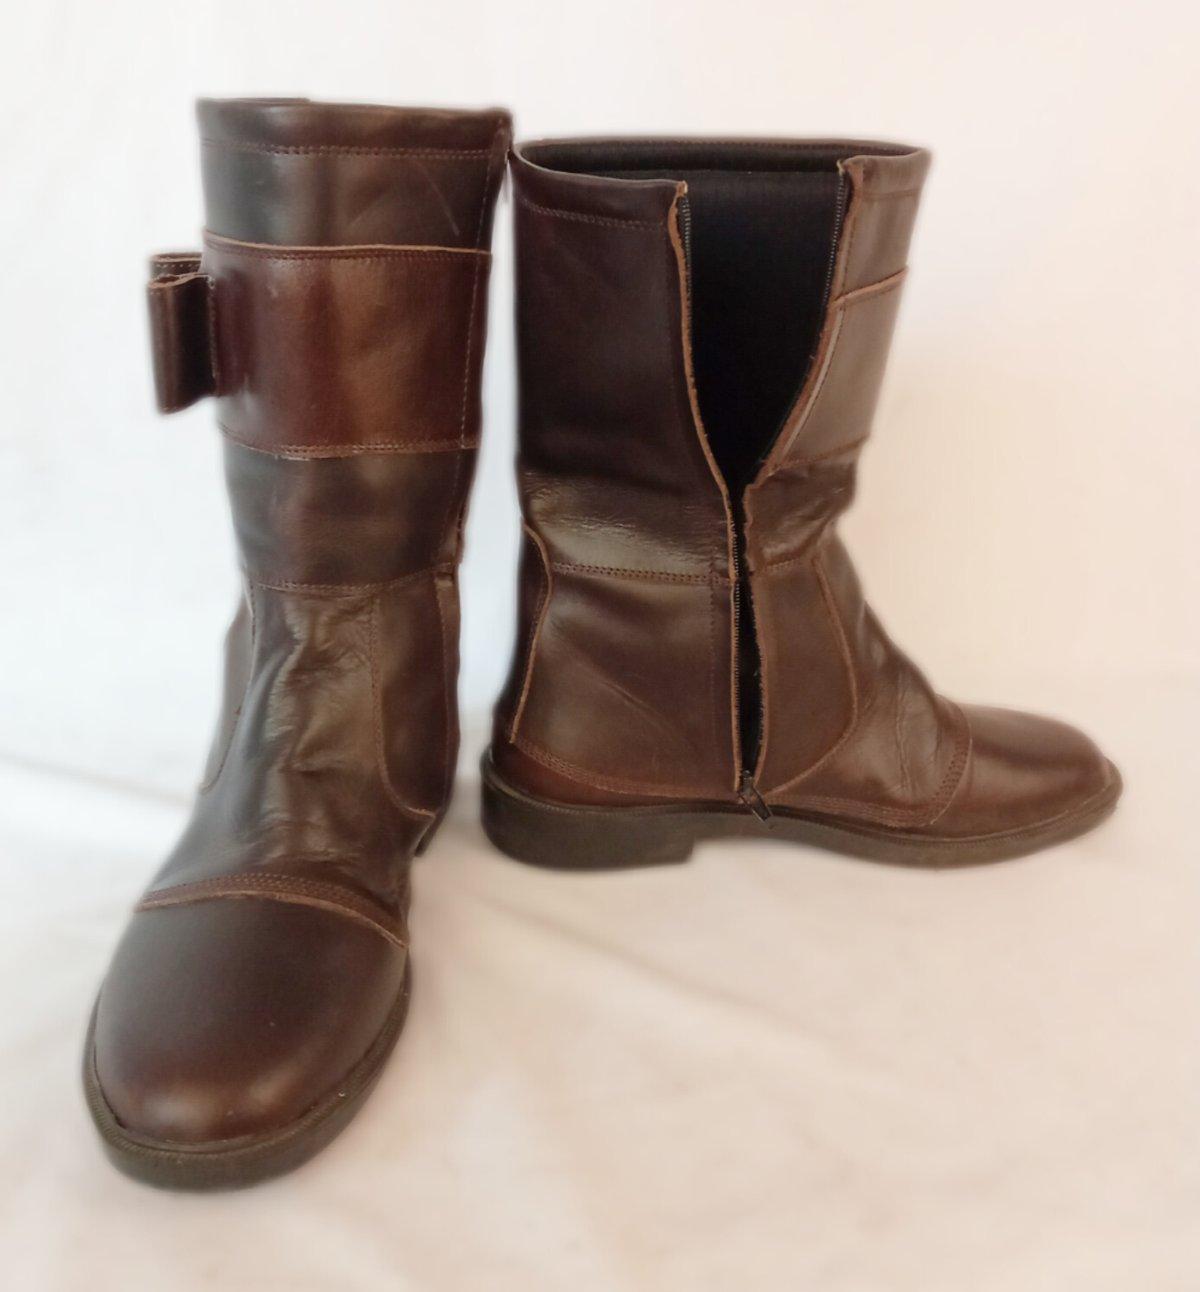 Image of #31 - B Grade from Stock - Shoe Size EU 39